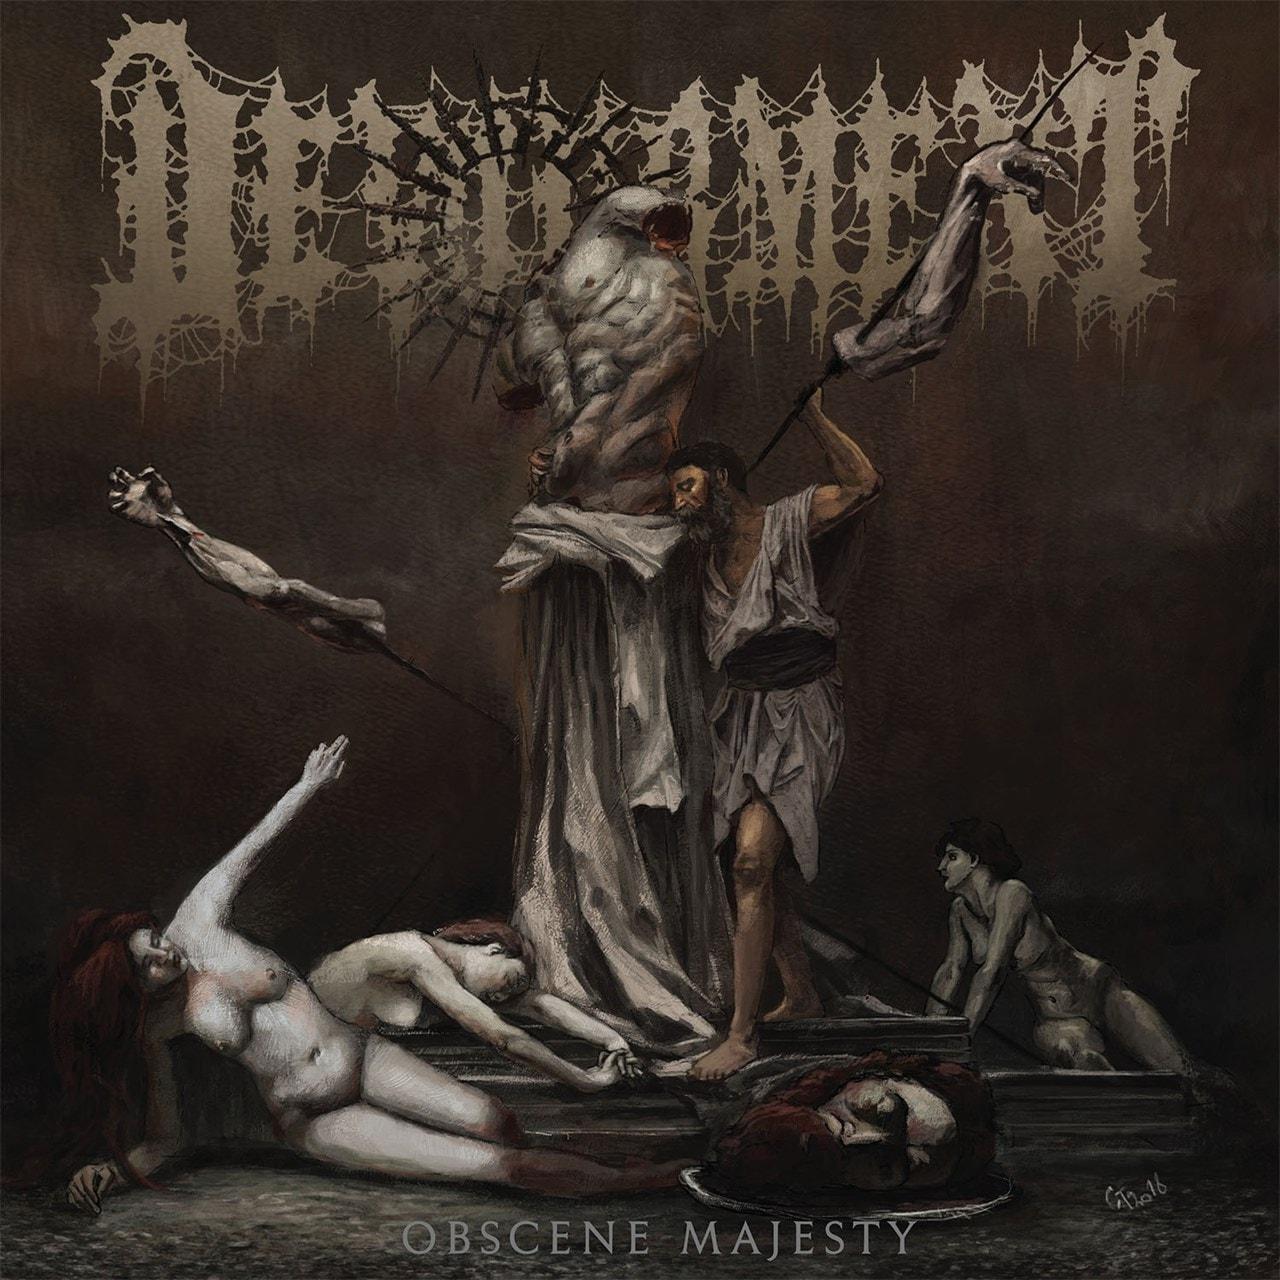 Obscene Majesty - 1